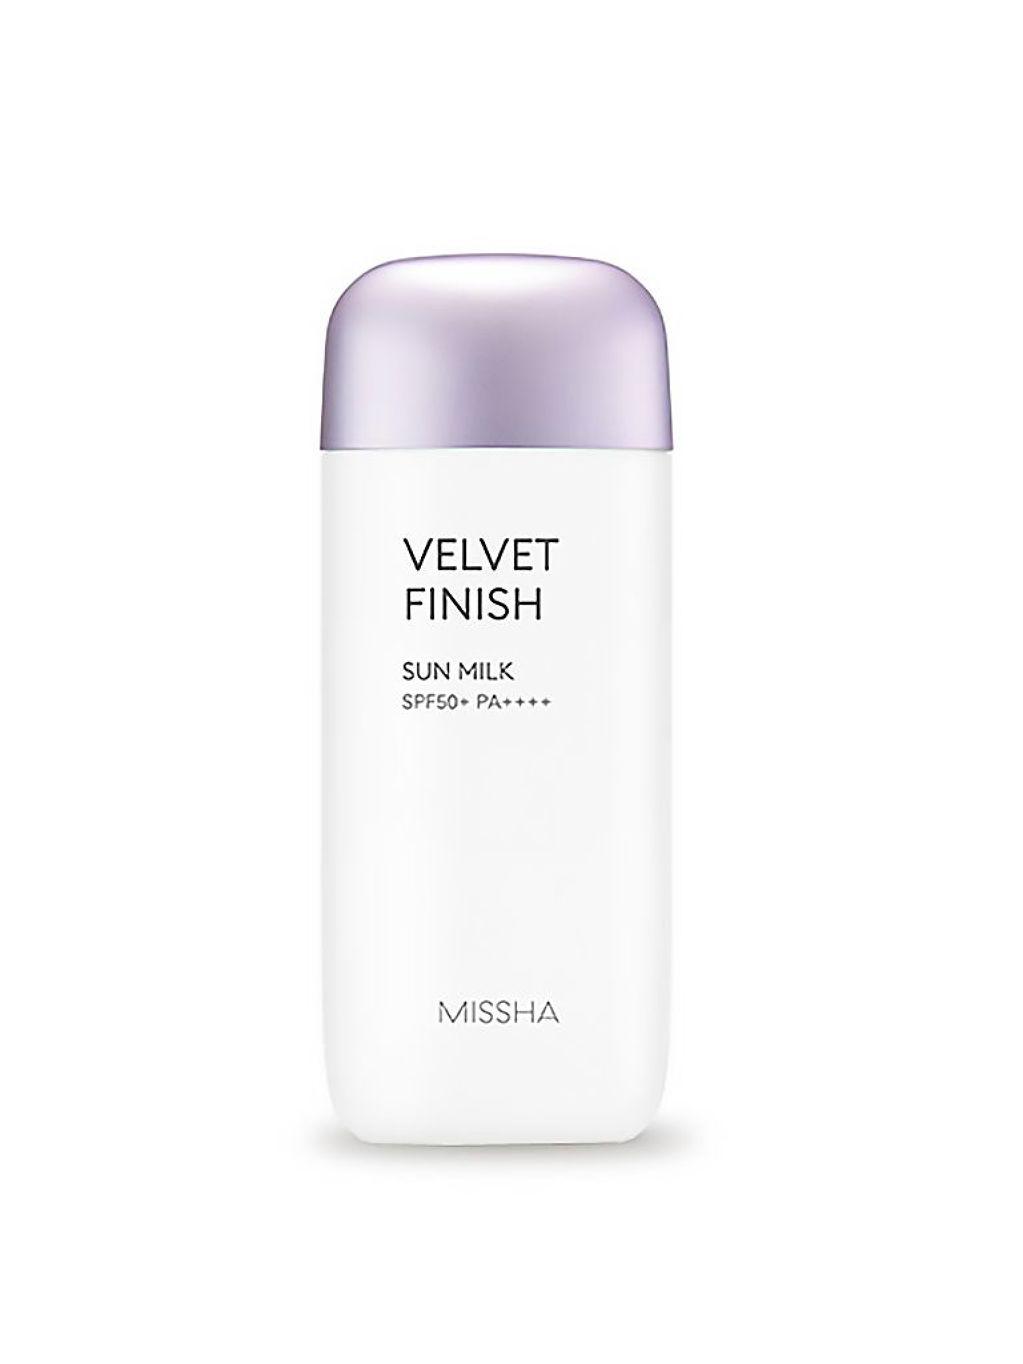 MISSHA All Around Safe Block Velvet Finish Sun Milk SPF50+ PA+++ 70ml - bee45-0918-missha-velvet-finish-sun-milk-70ml-product-thumbnail.jpg